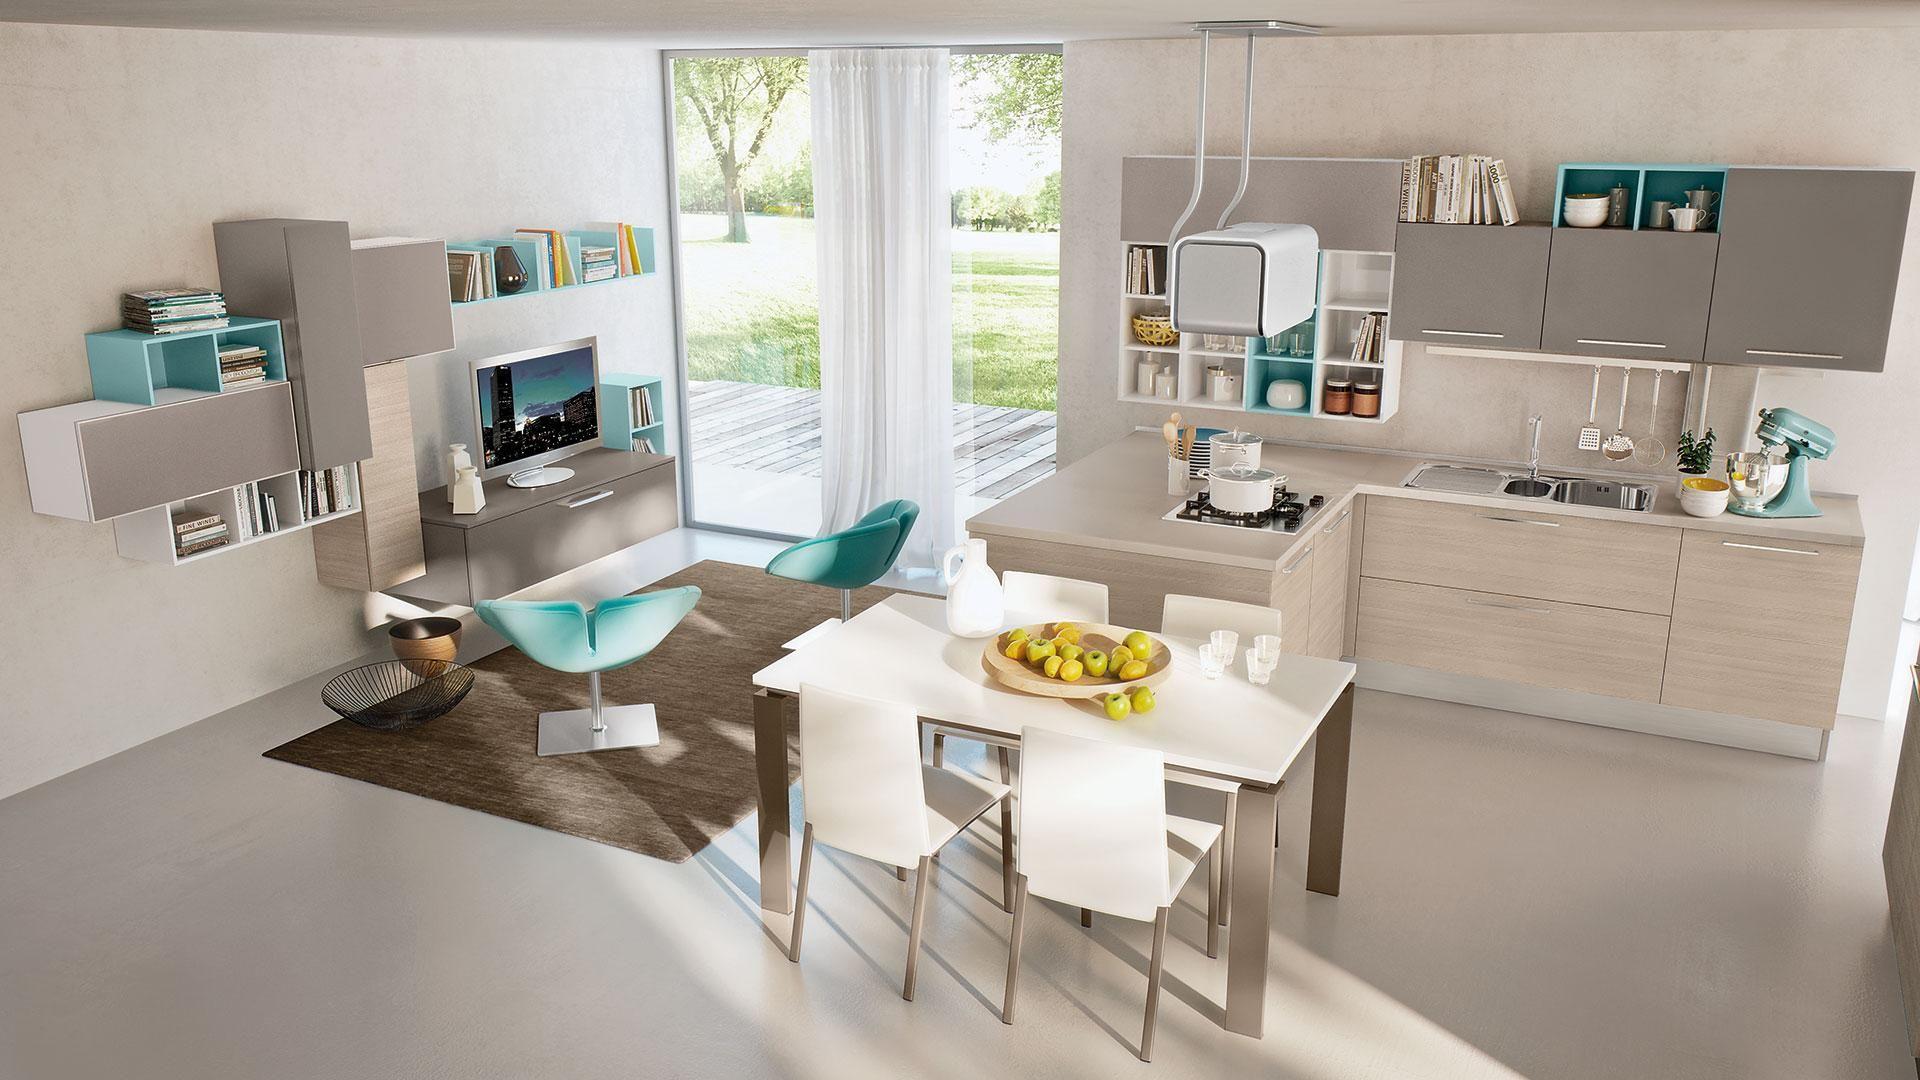 Swing - Cucine Lube | cucina | Pinterest | Cucine, Cucina moderna ...